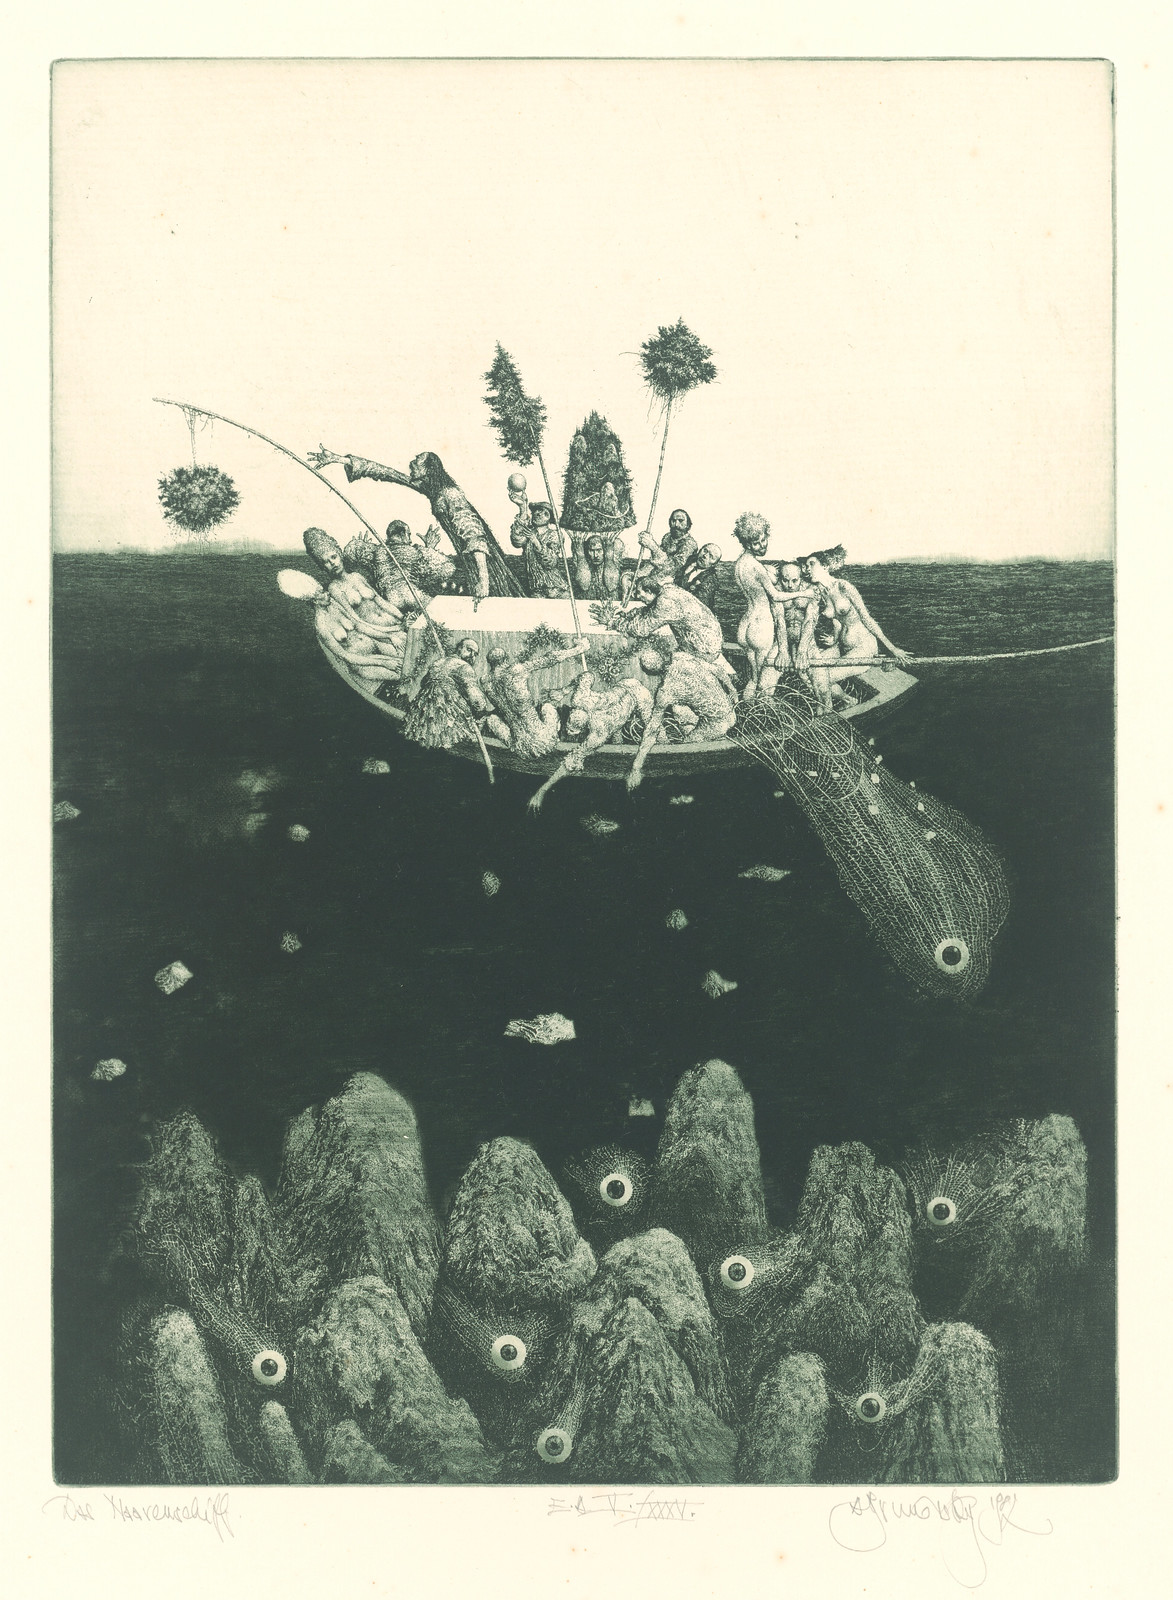 Albin Brunovsky - The Ship of Fools, 1982